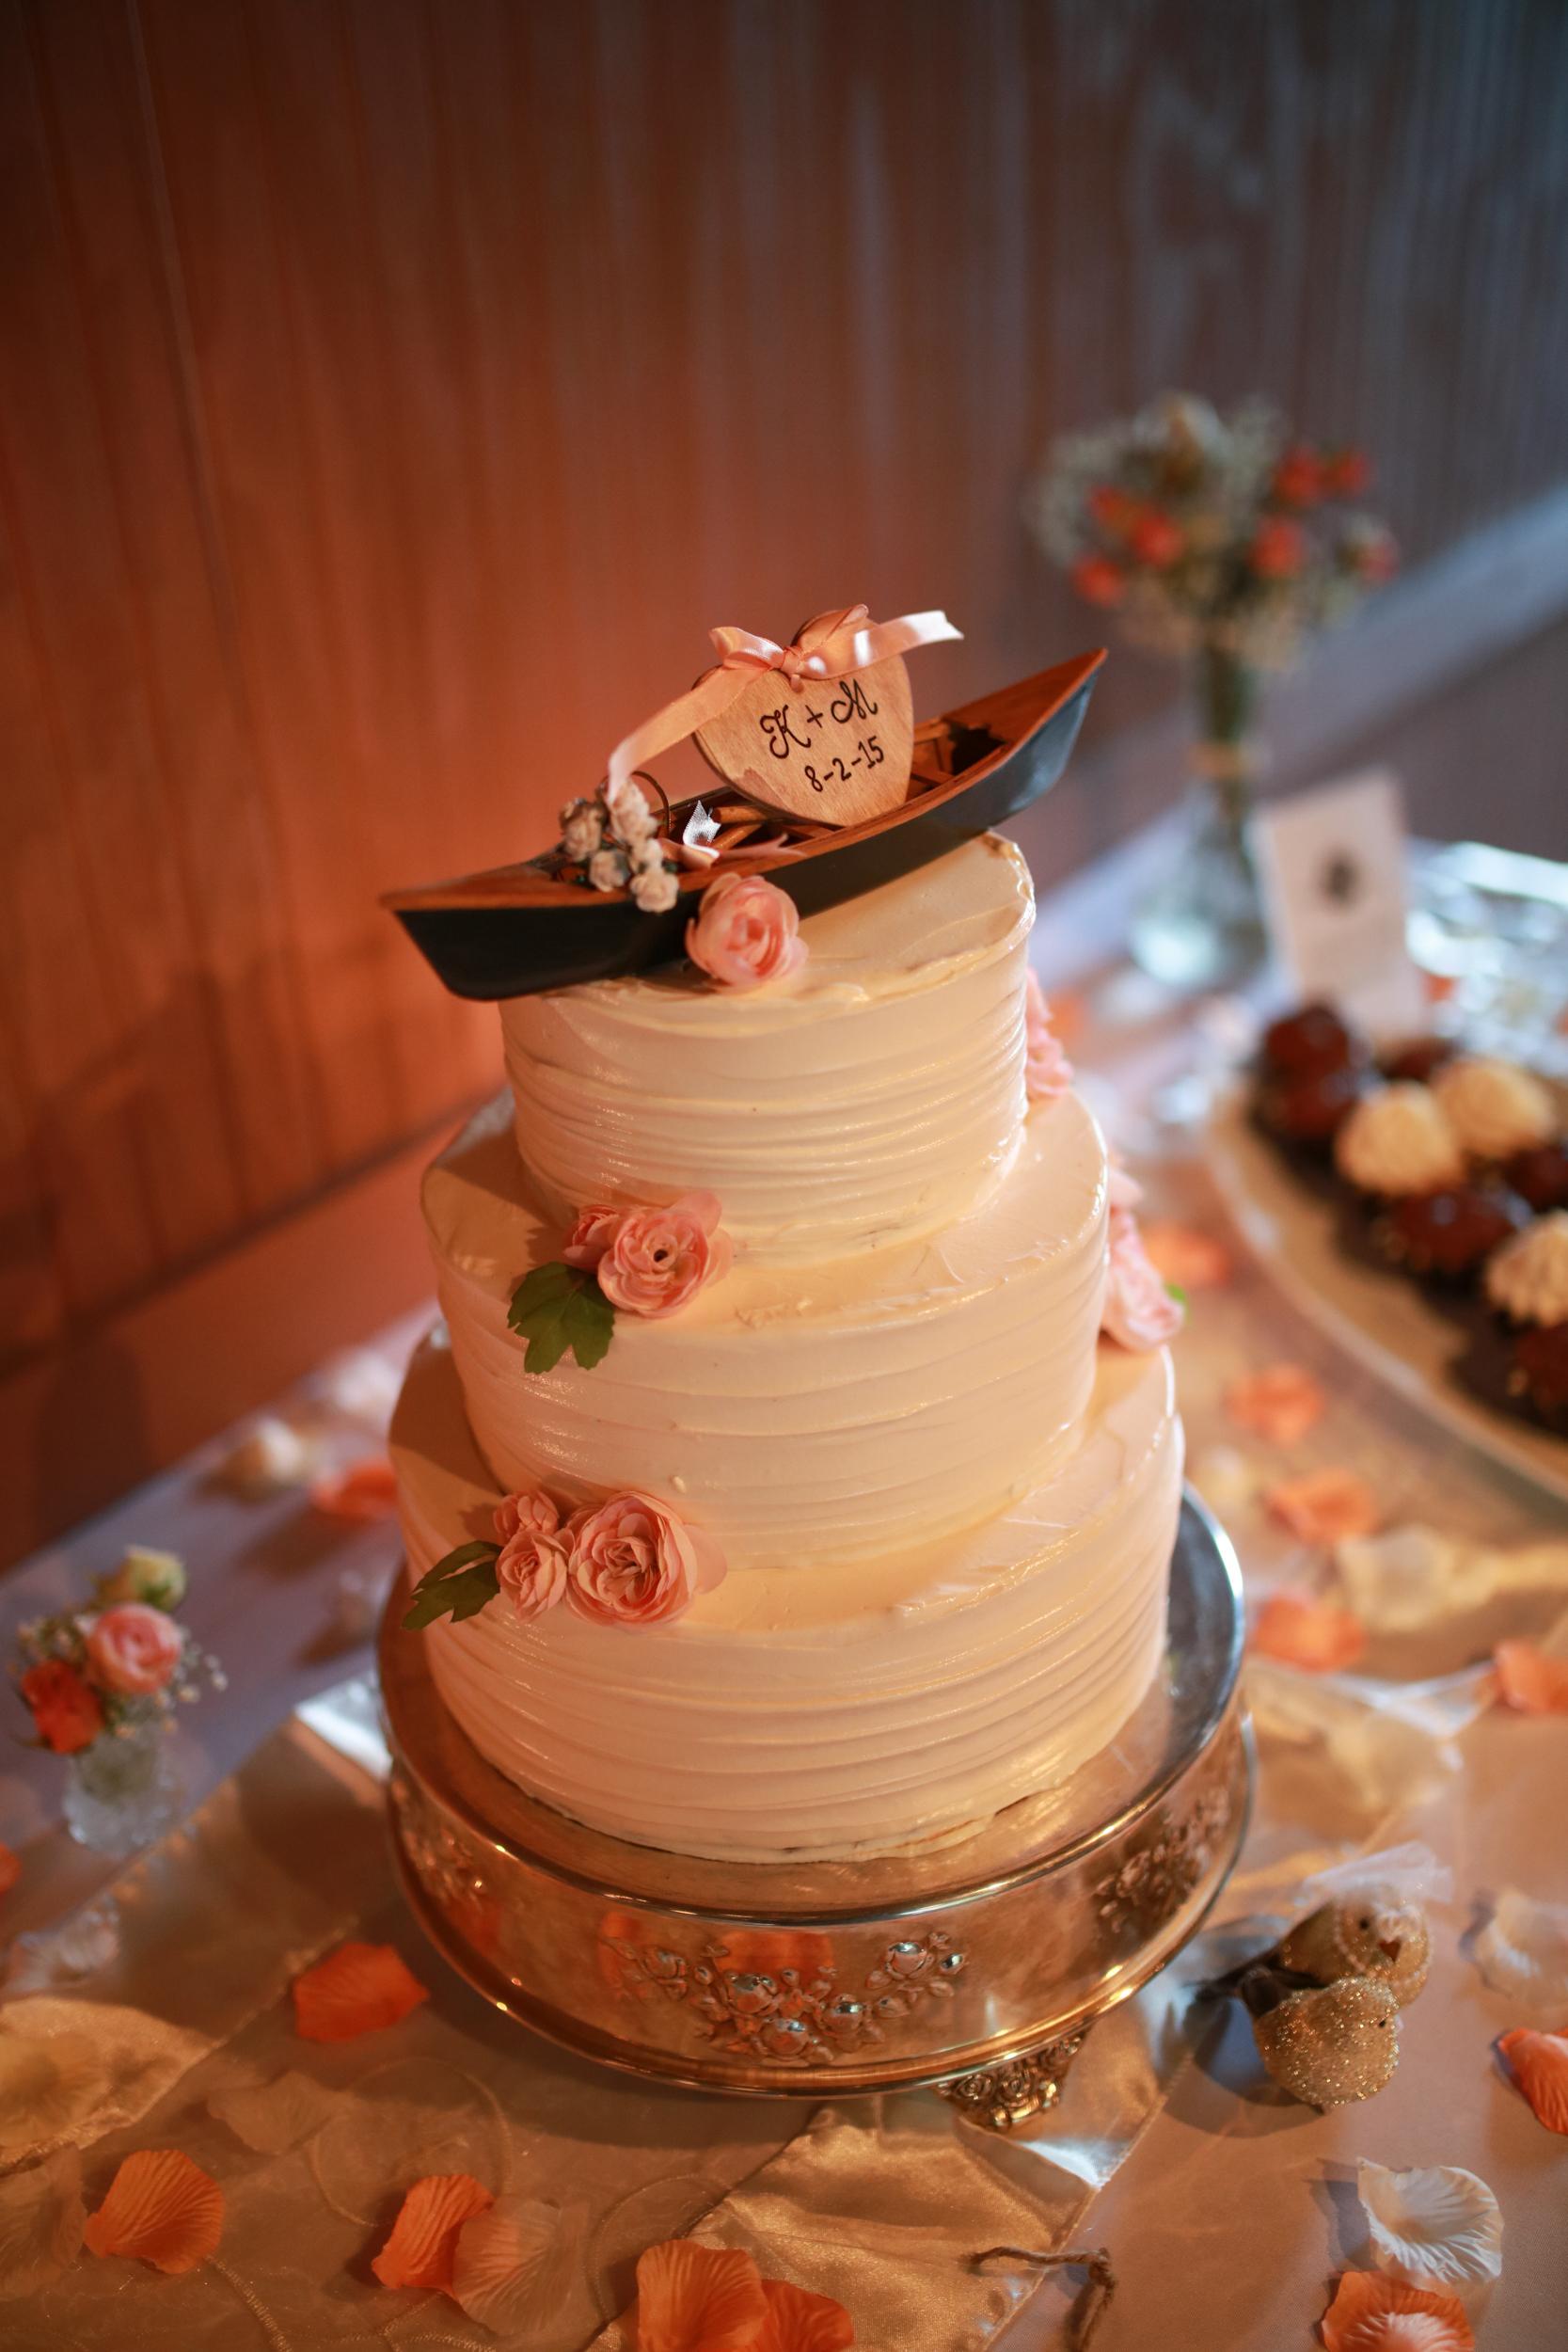 Wedding cake at the full moon resort